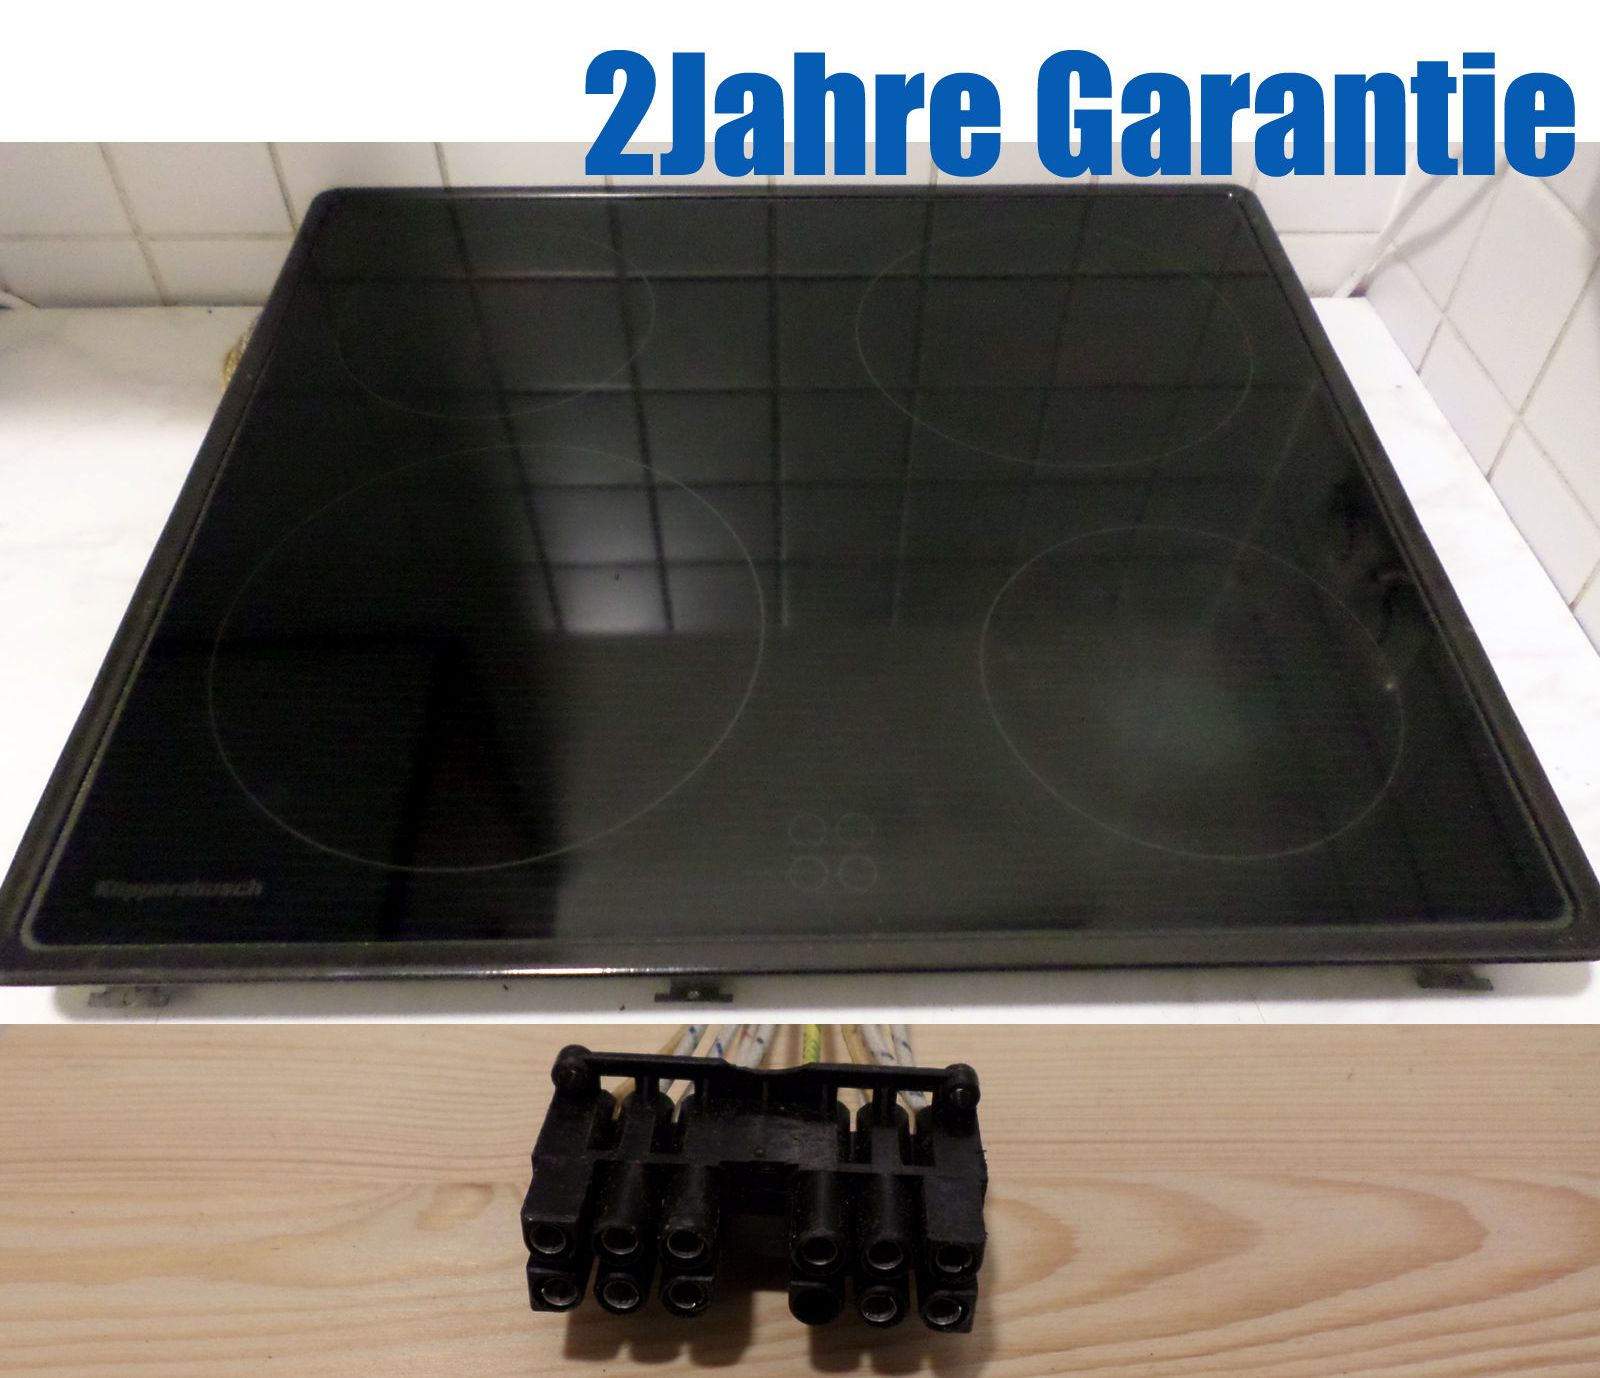 ceran gas kochfeld miele gaskochfeld km with ceran gas kochfeld elegant with ceran gas. Black Bedroom Furniture Sets. Home Design Ideas